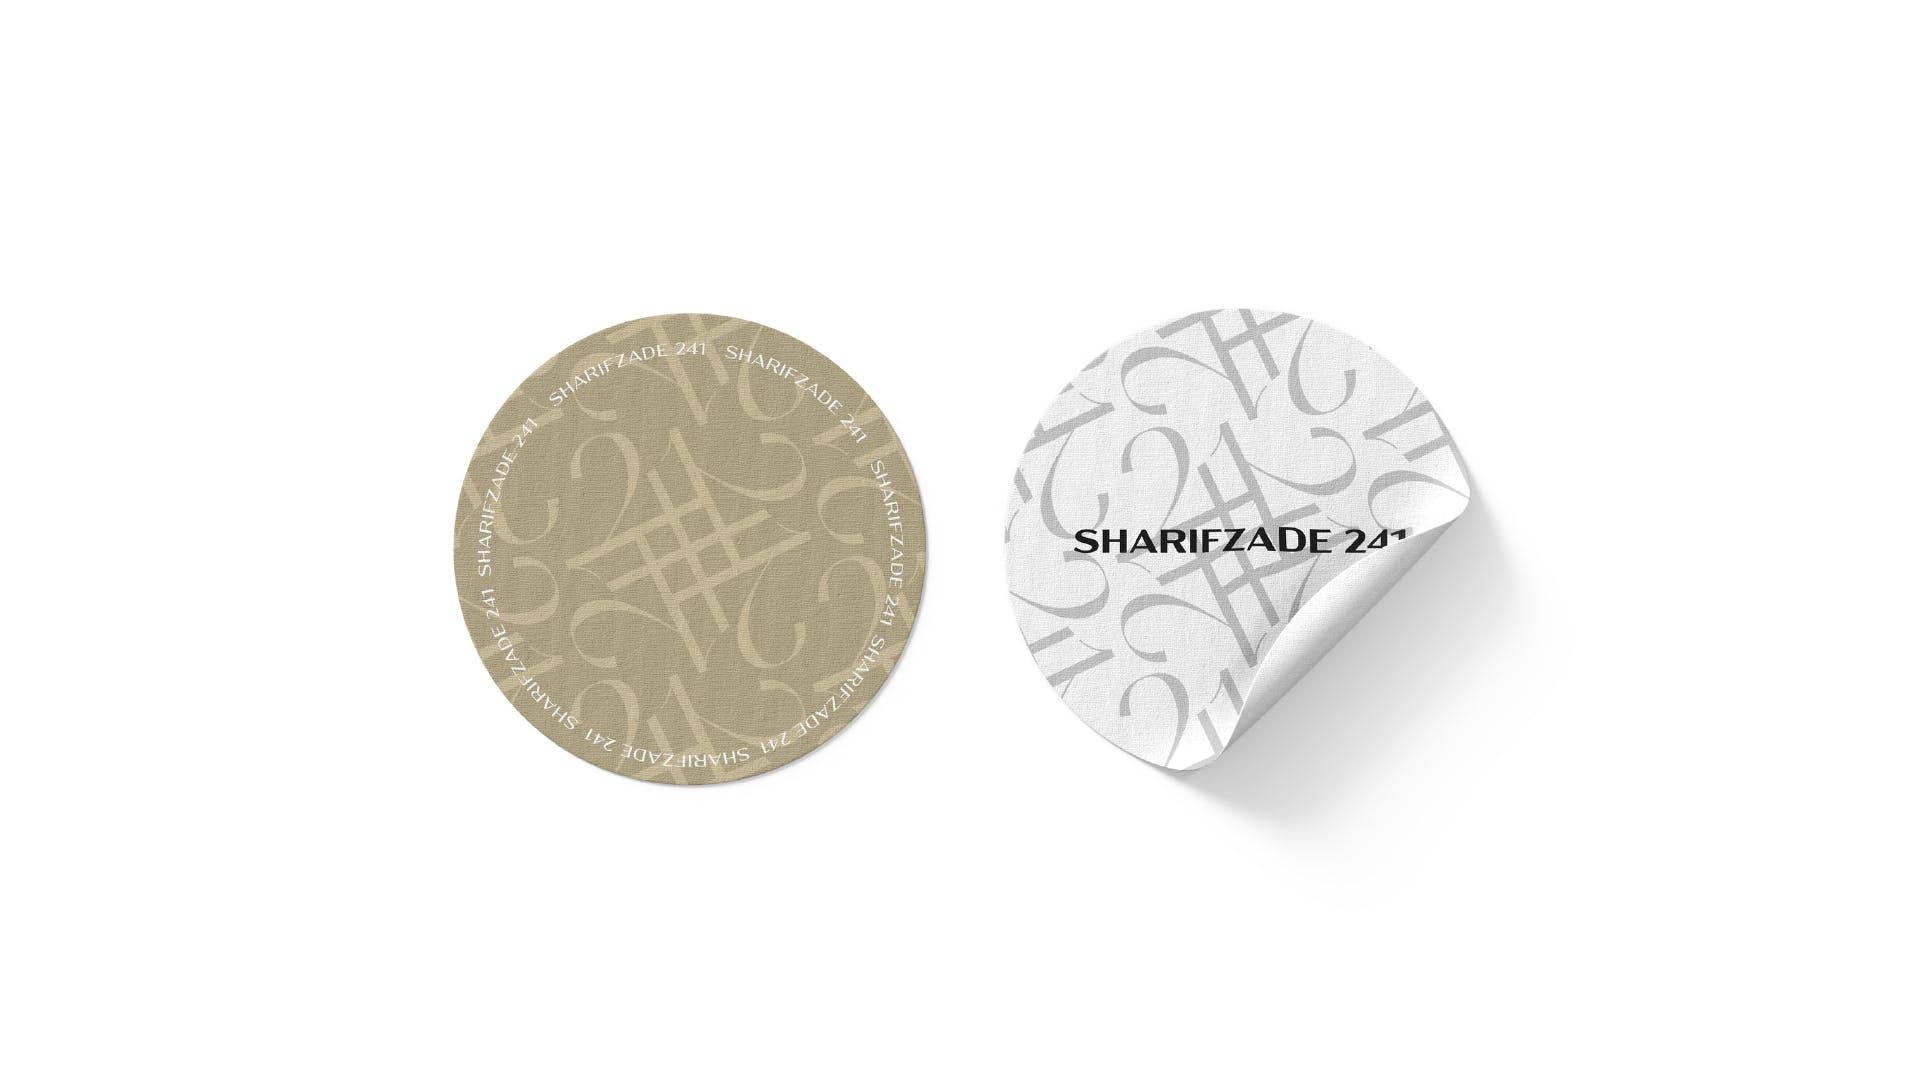 SHARIFZADE-241 BRANDING